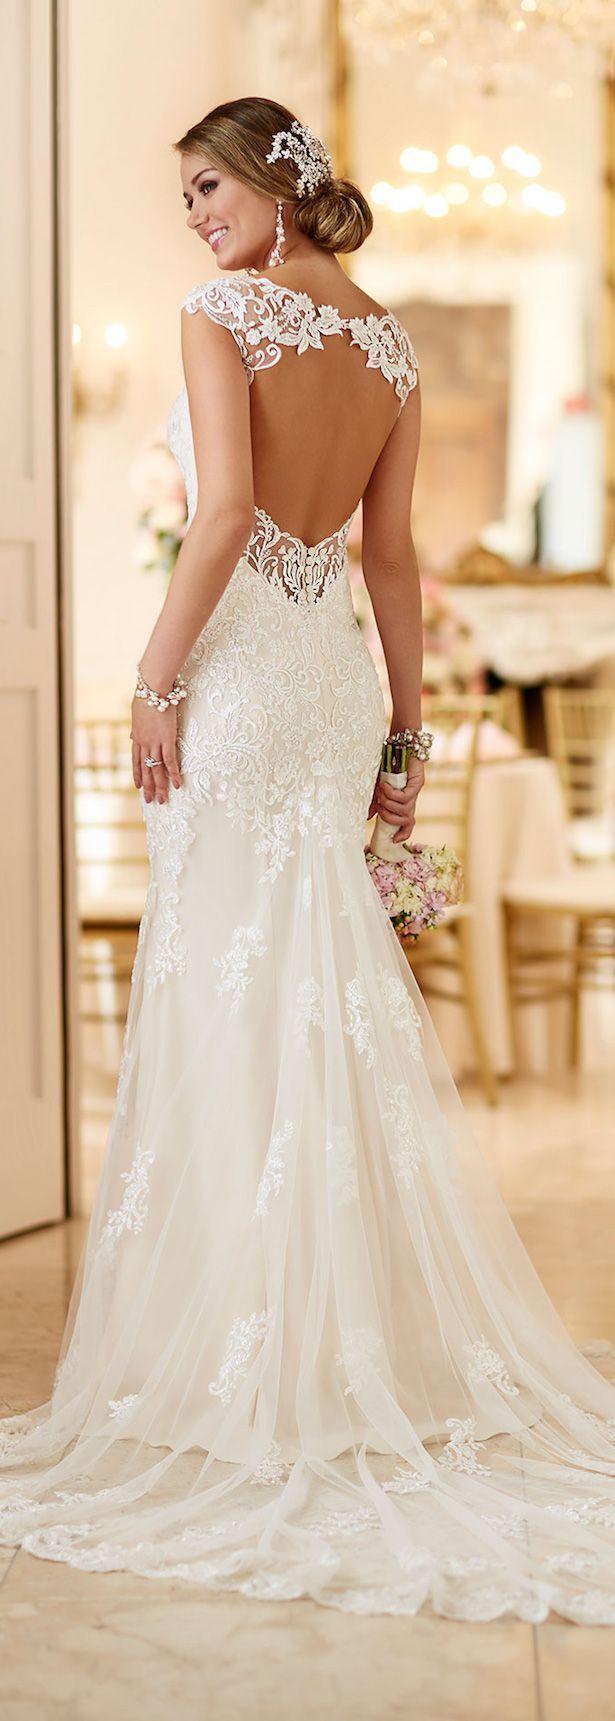 wedding dresses lace best photos - wedding dresses - http://cuteweddingideas.com